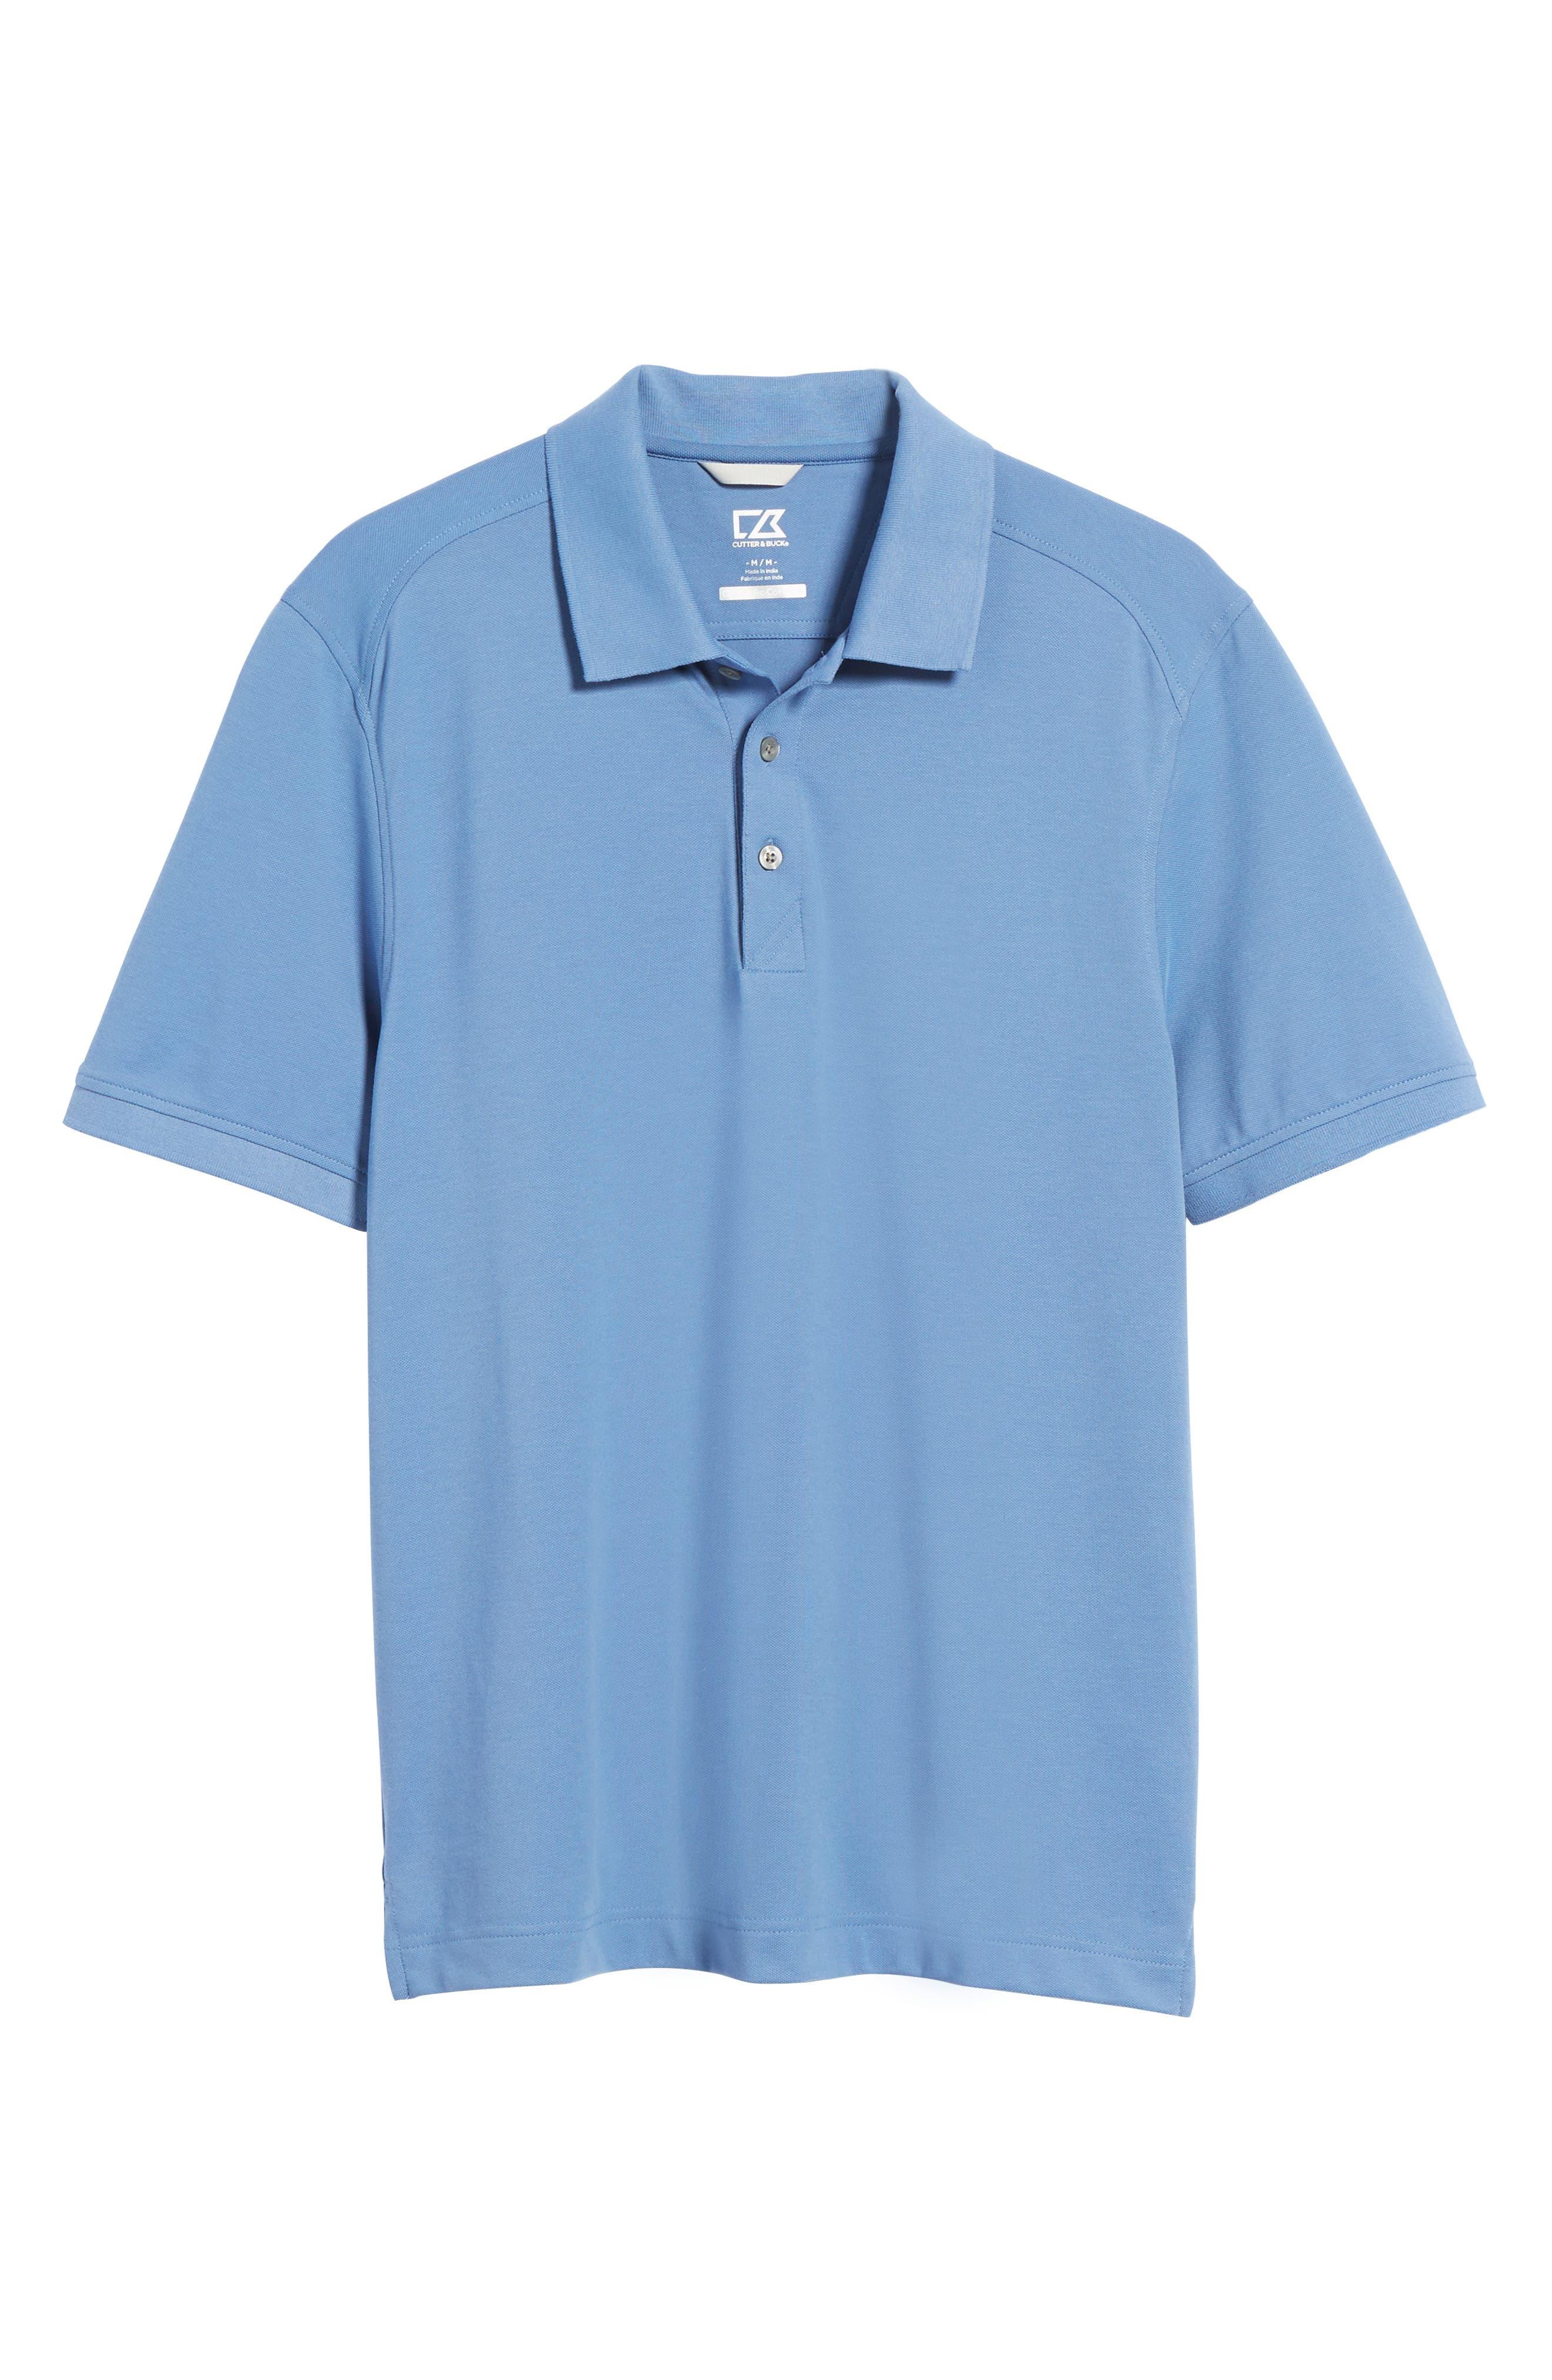 Advantage Golf Polo,                             Alternate thumbnail 6, color,                             SEA BLUE